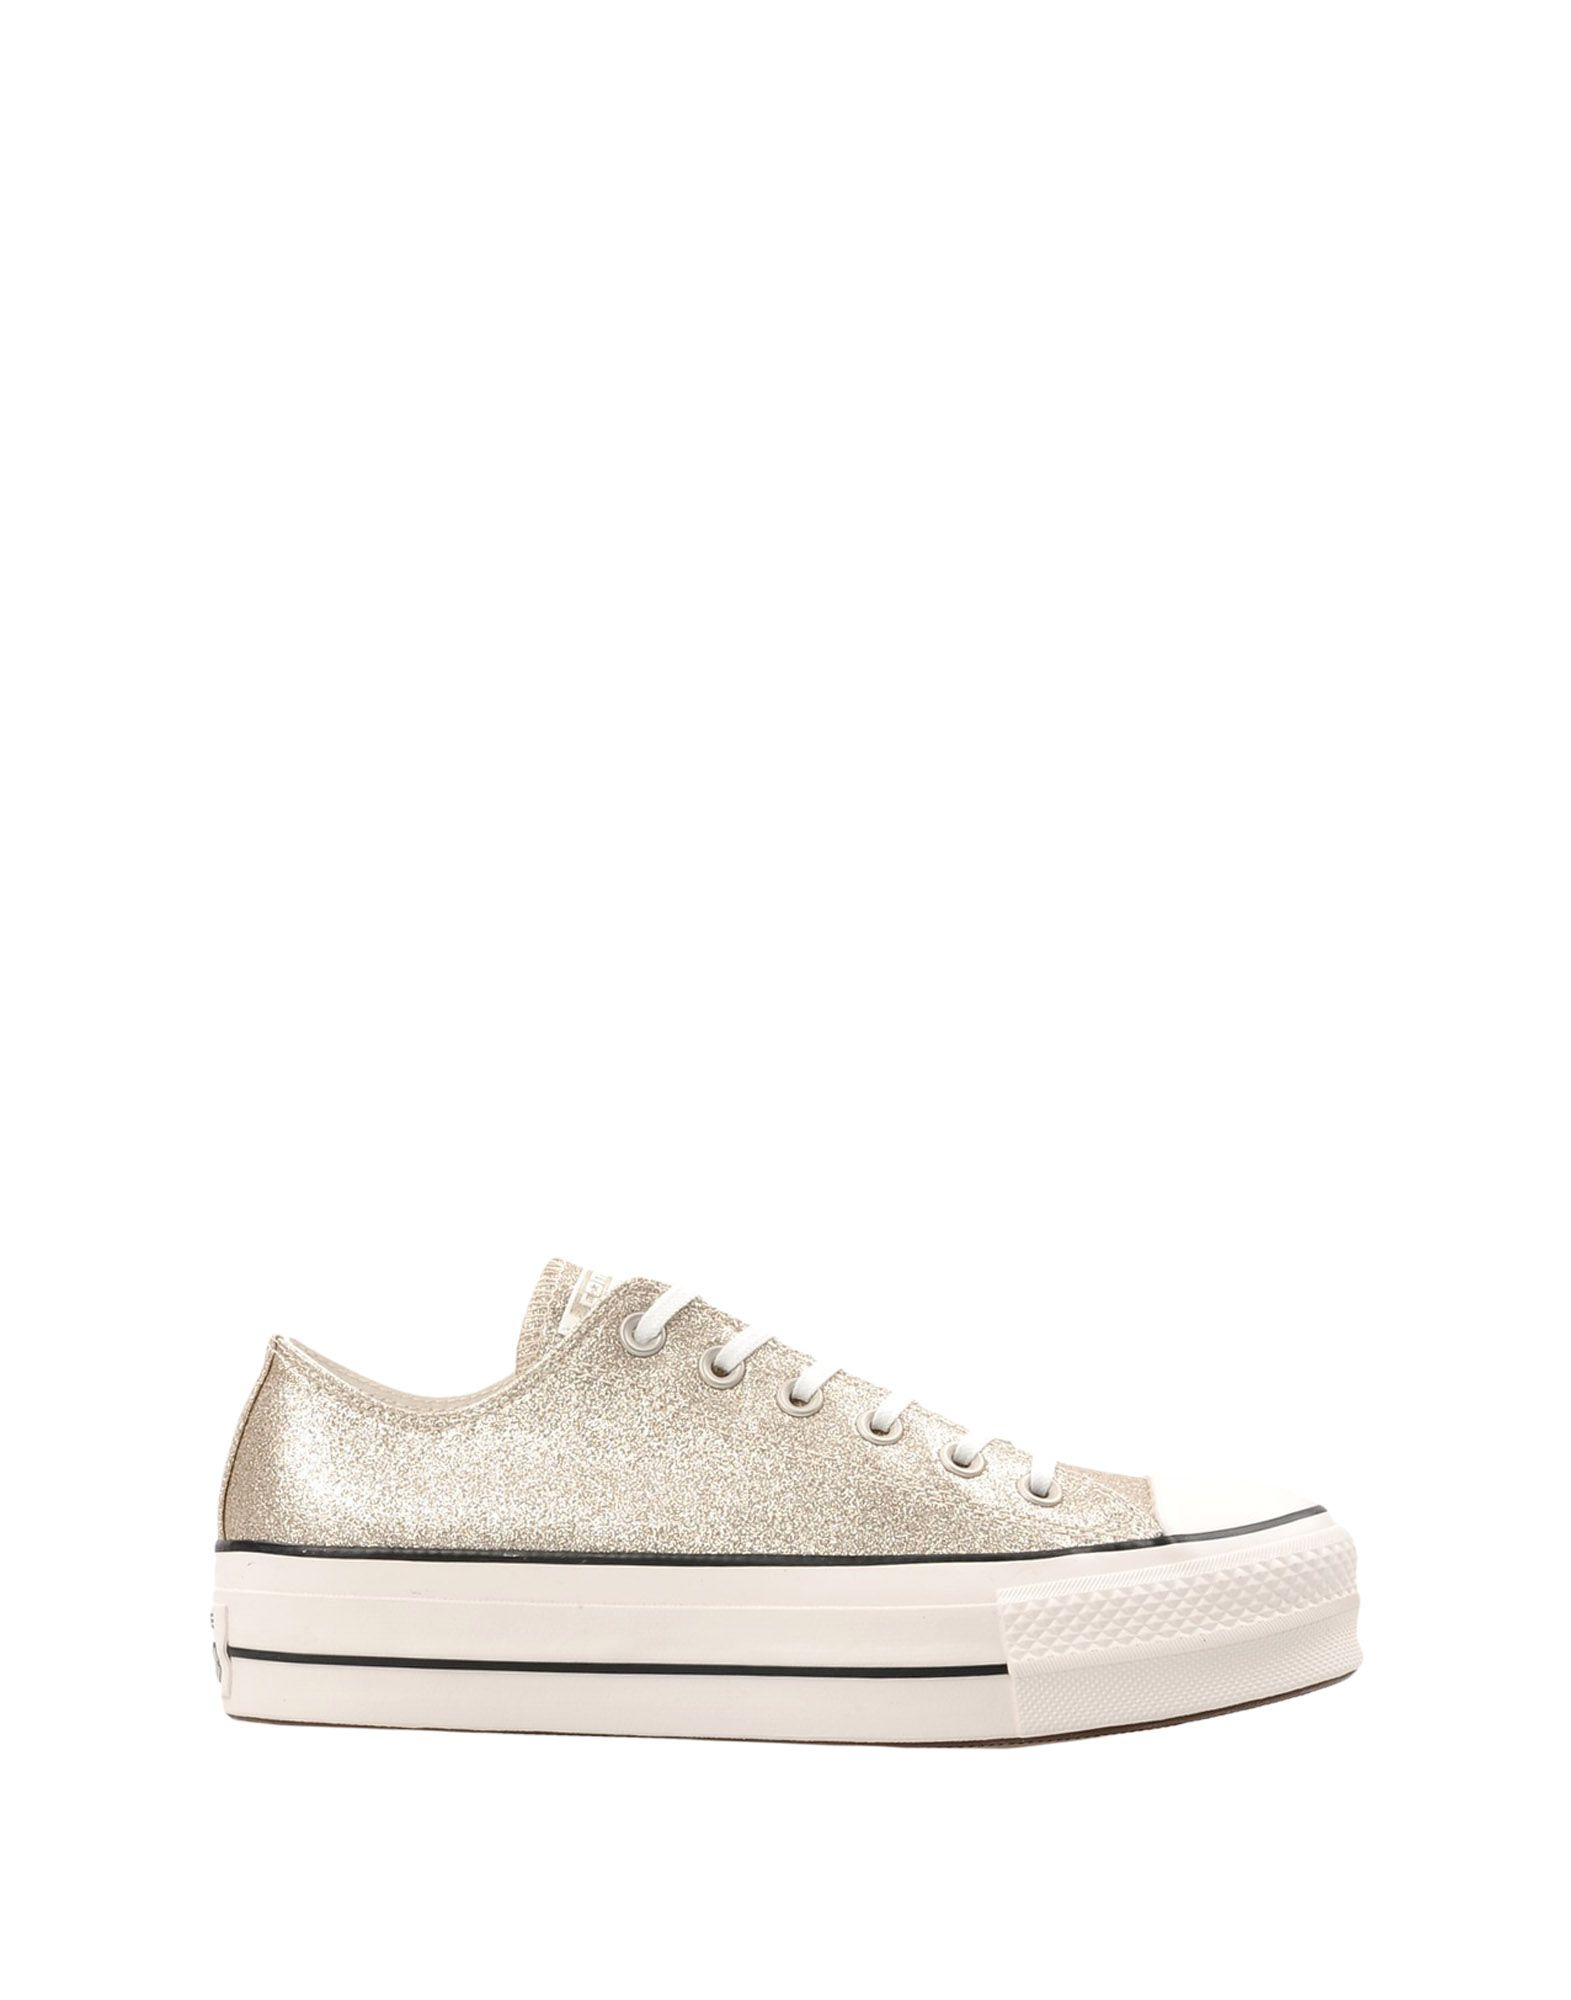 Converse All Star Ctas Ox Ox Ox Lift Clean - Sneakers - Women Converse All Star Sneakers online on  United Kingdom - 11445730DT 94a135